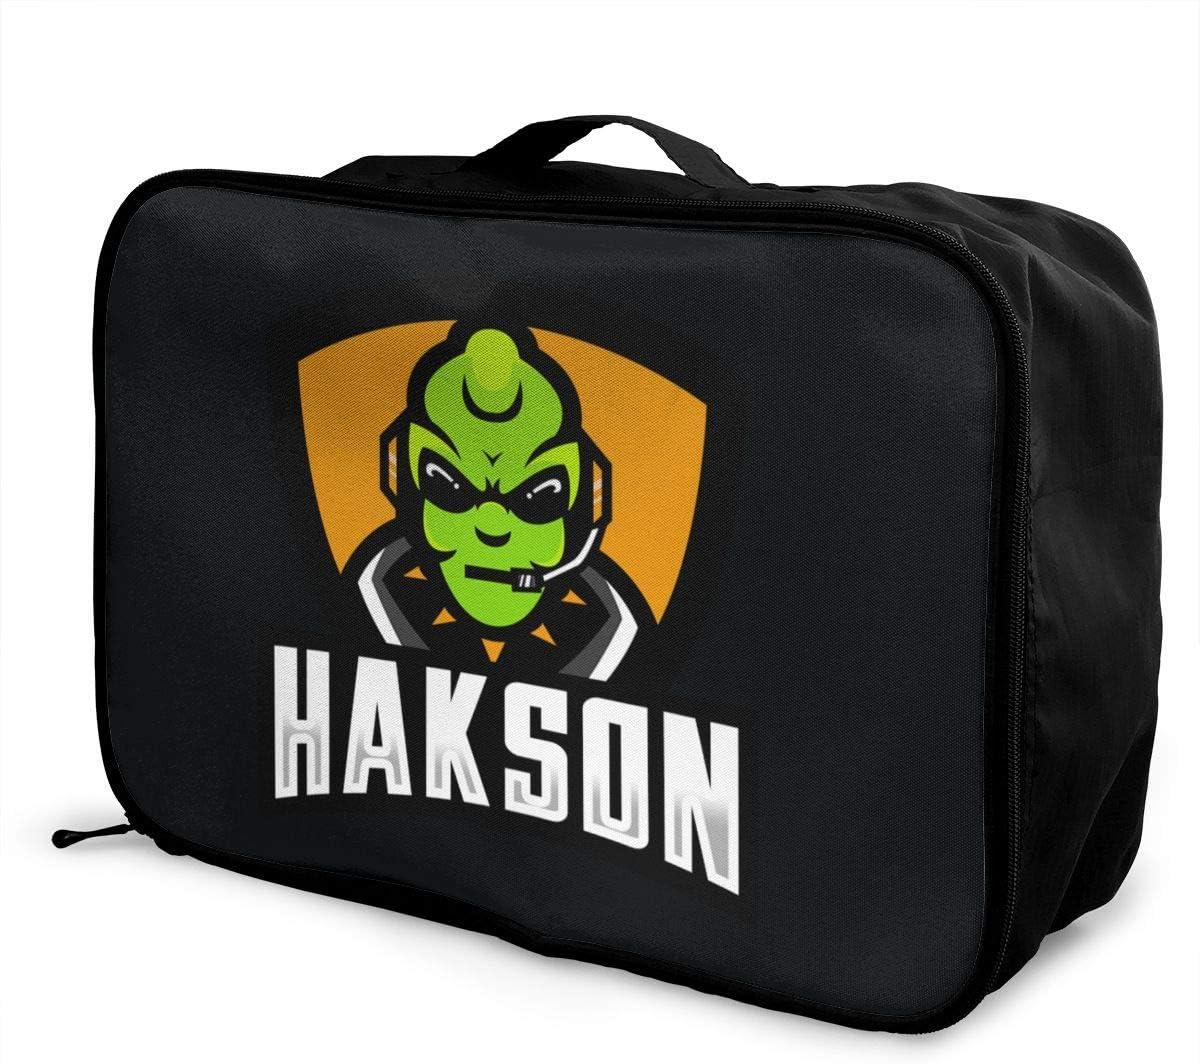 Gaming Alien LOGO Travel Duffel Bag Lightweight Large Capacity Portable Luggage Bag Weekender Carry-on Tote